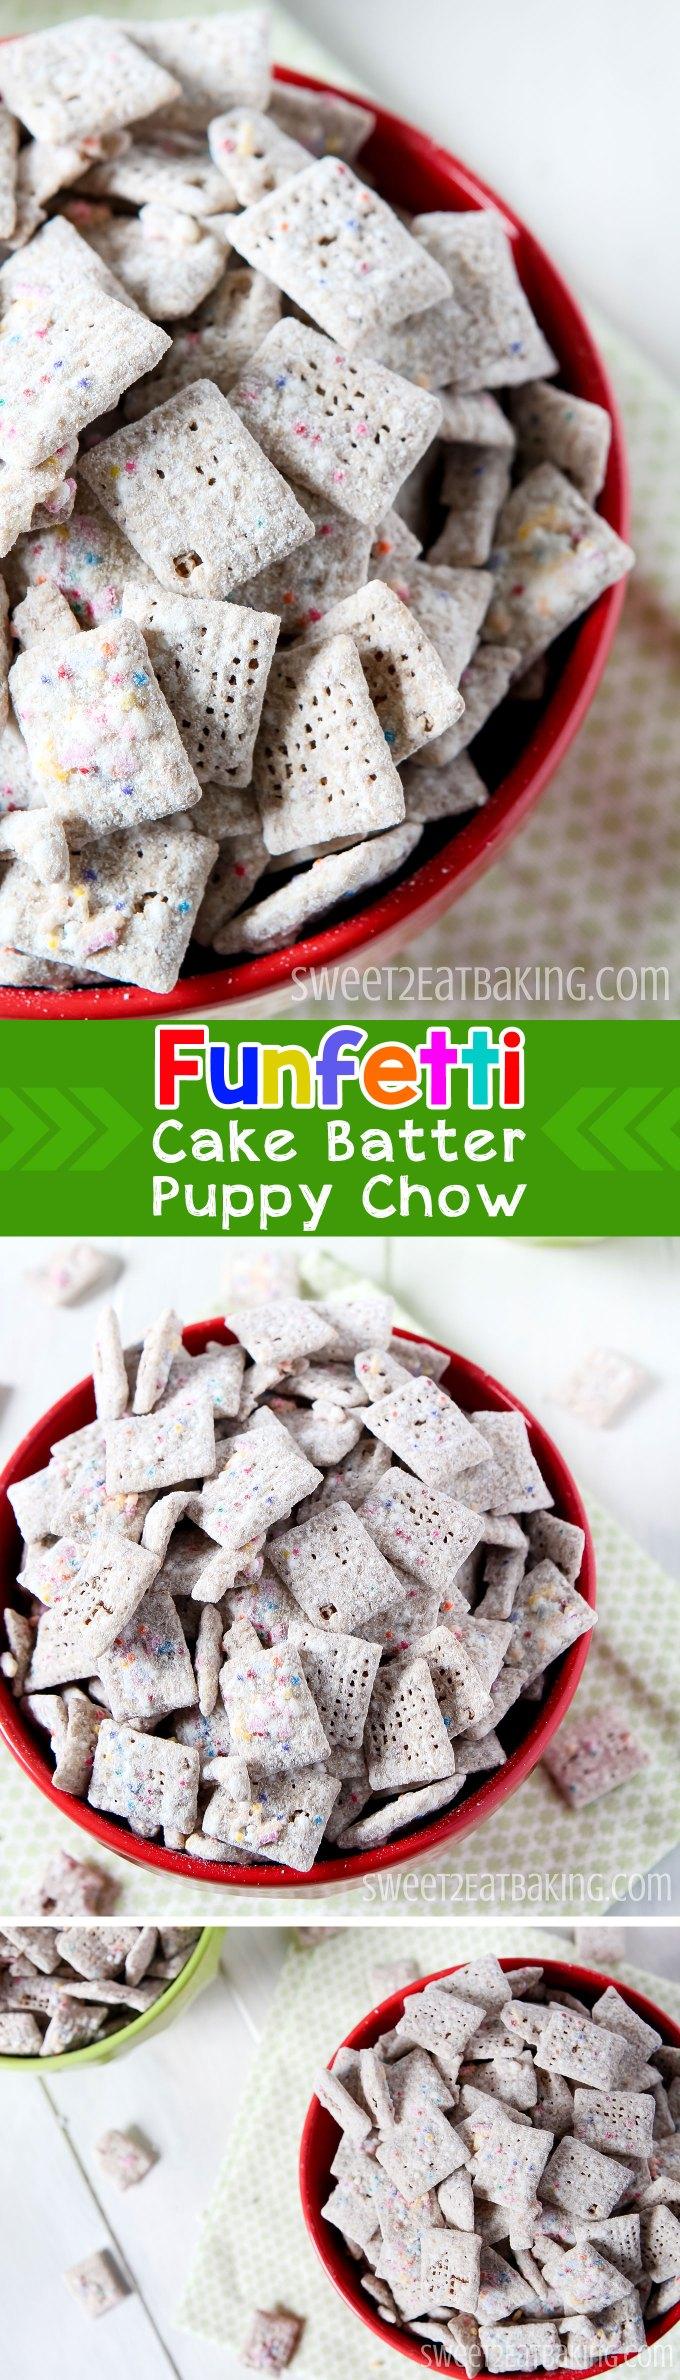 Funfetti Cake Batter Puppy Chow (Muddy Buddies) Chex Recipe by Sweet2EatBaking.com